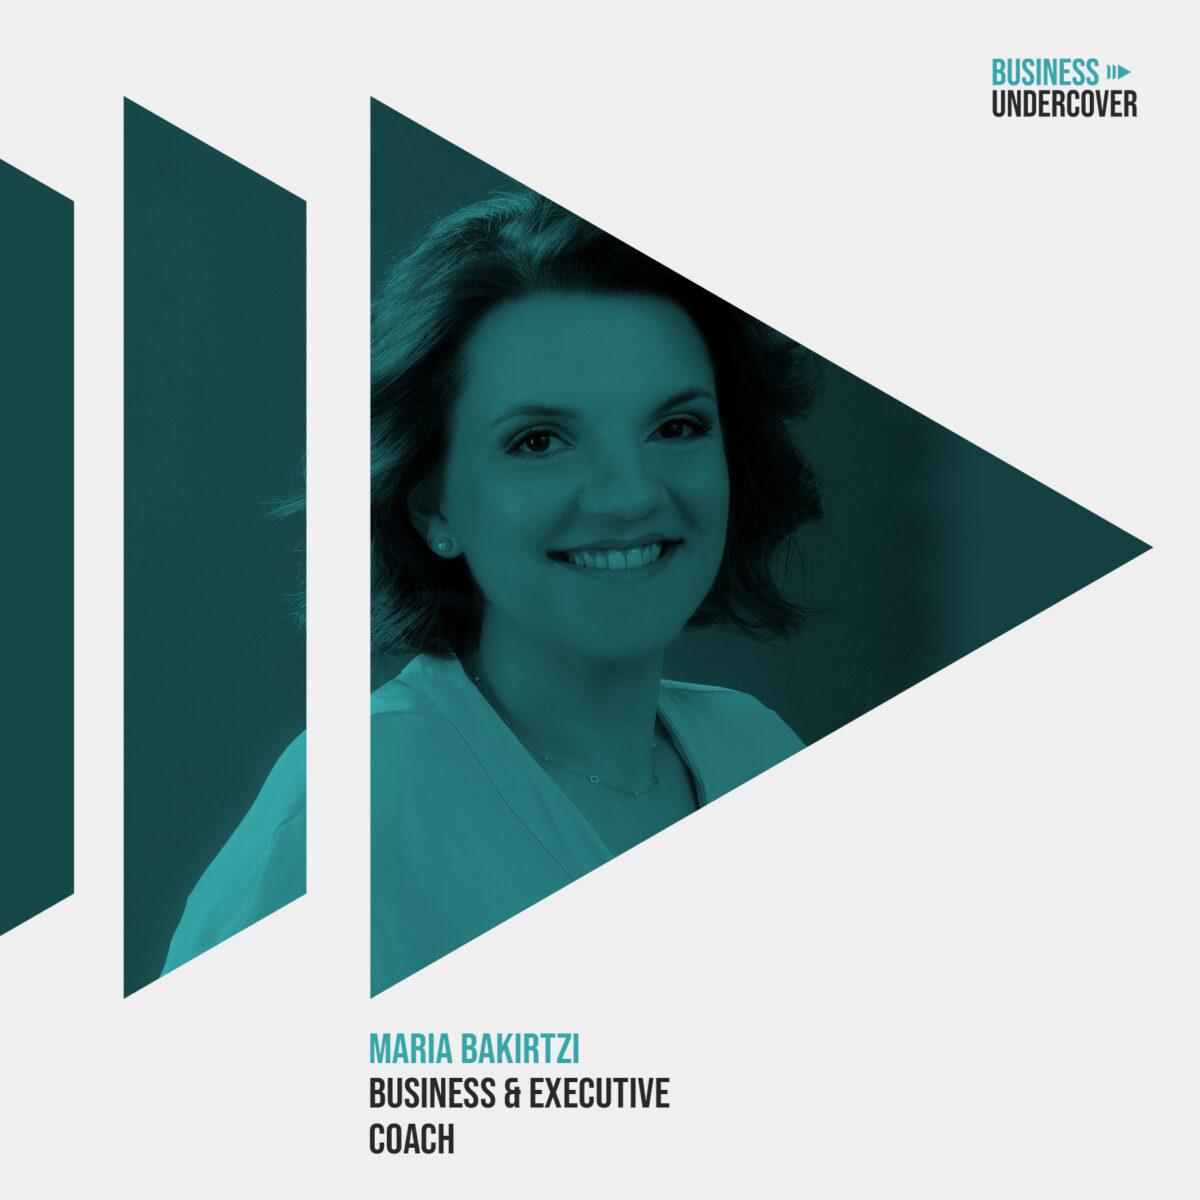 Executive Coaching: Πως να πετύχεις τους στόχους σου ως leader — Μαρία Μπακιρτζή